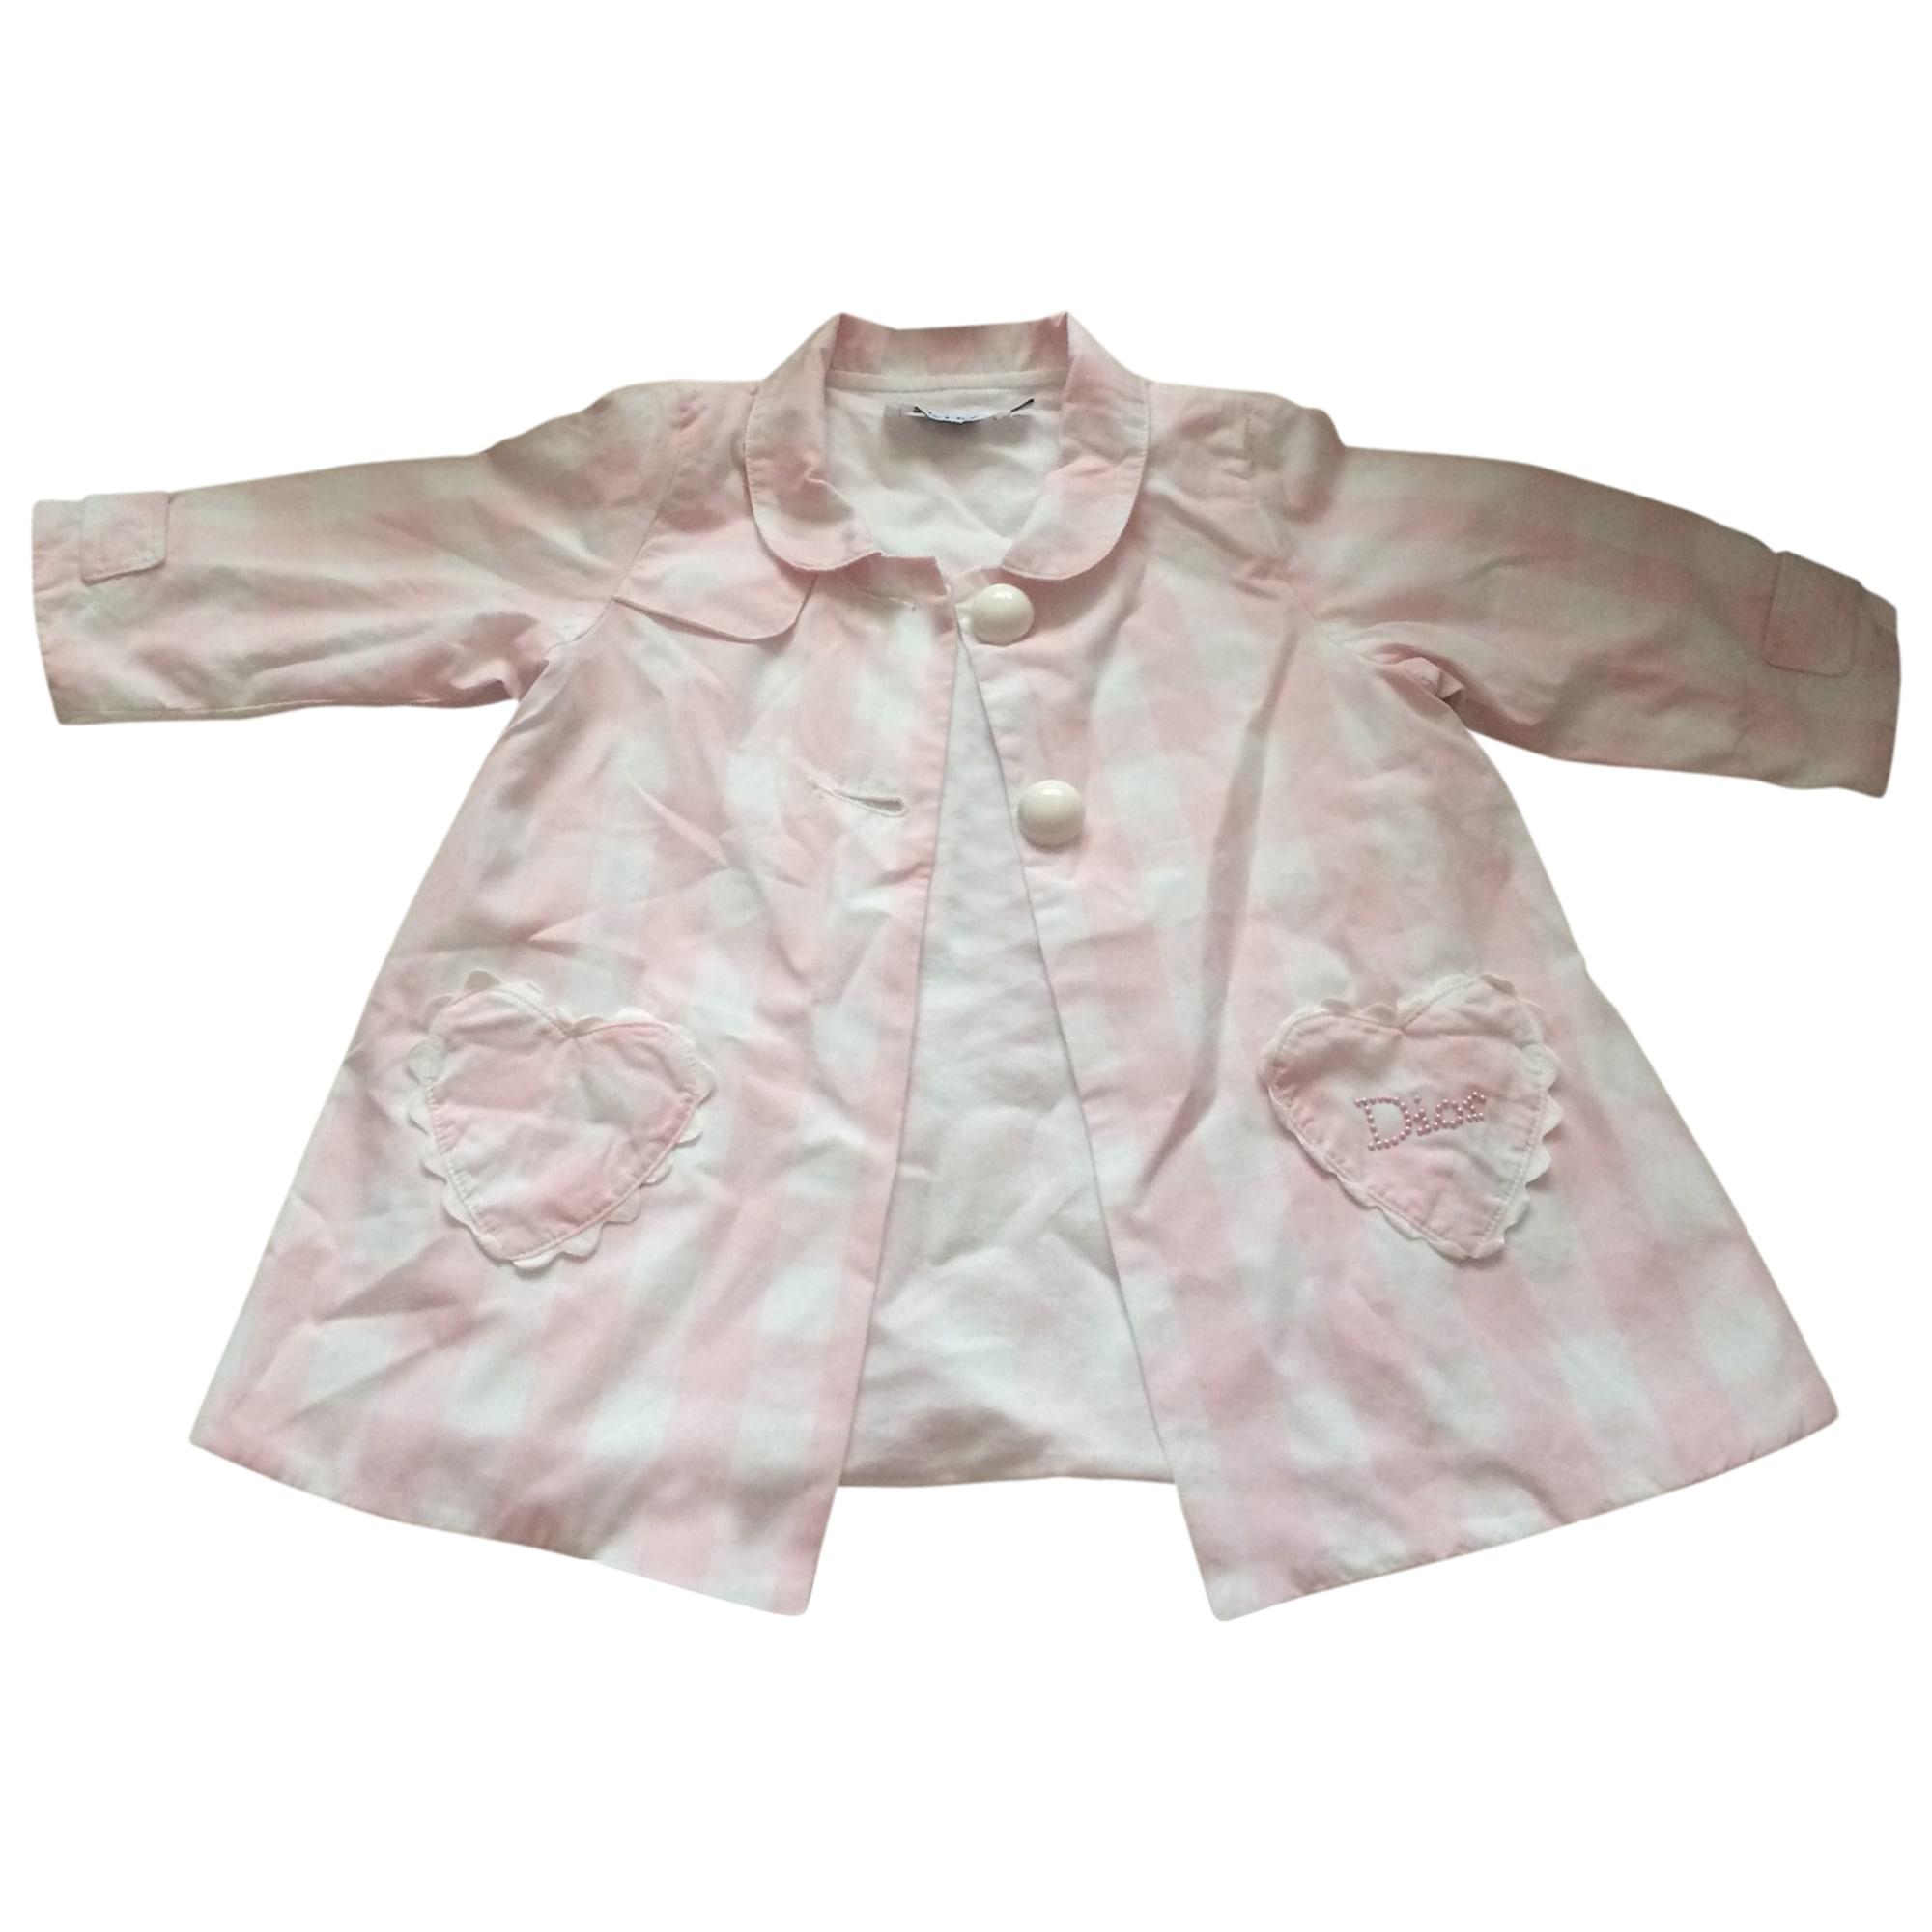 Coat BABY DIOR Pink, fuchsia, light pink